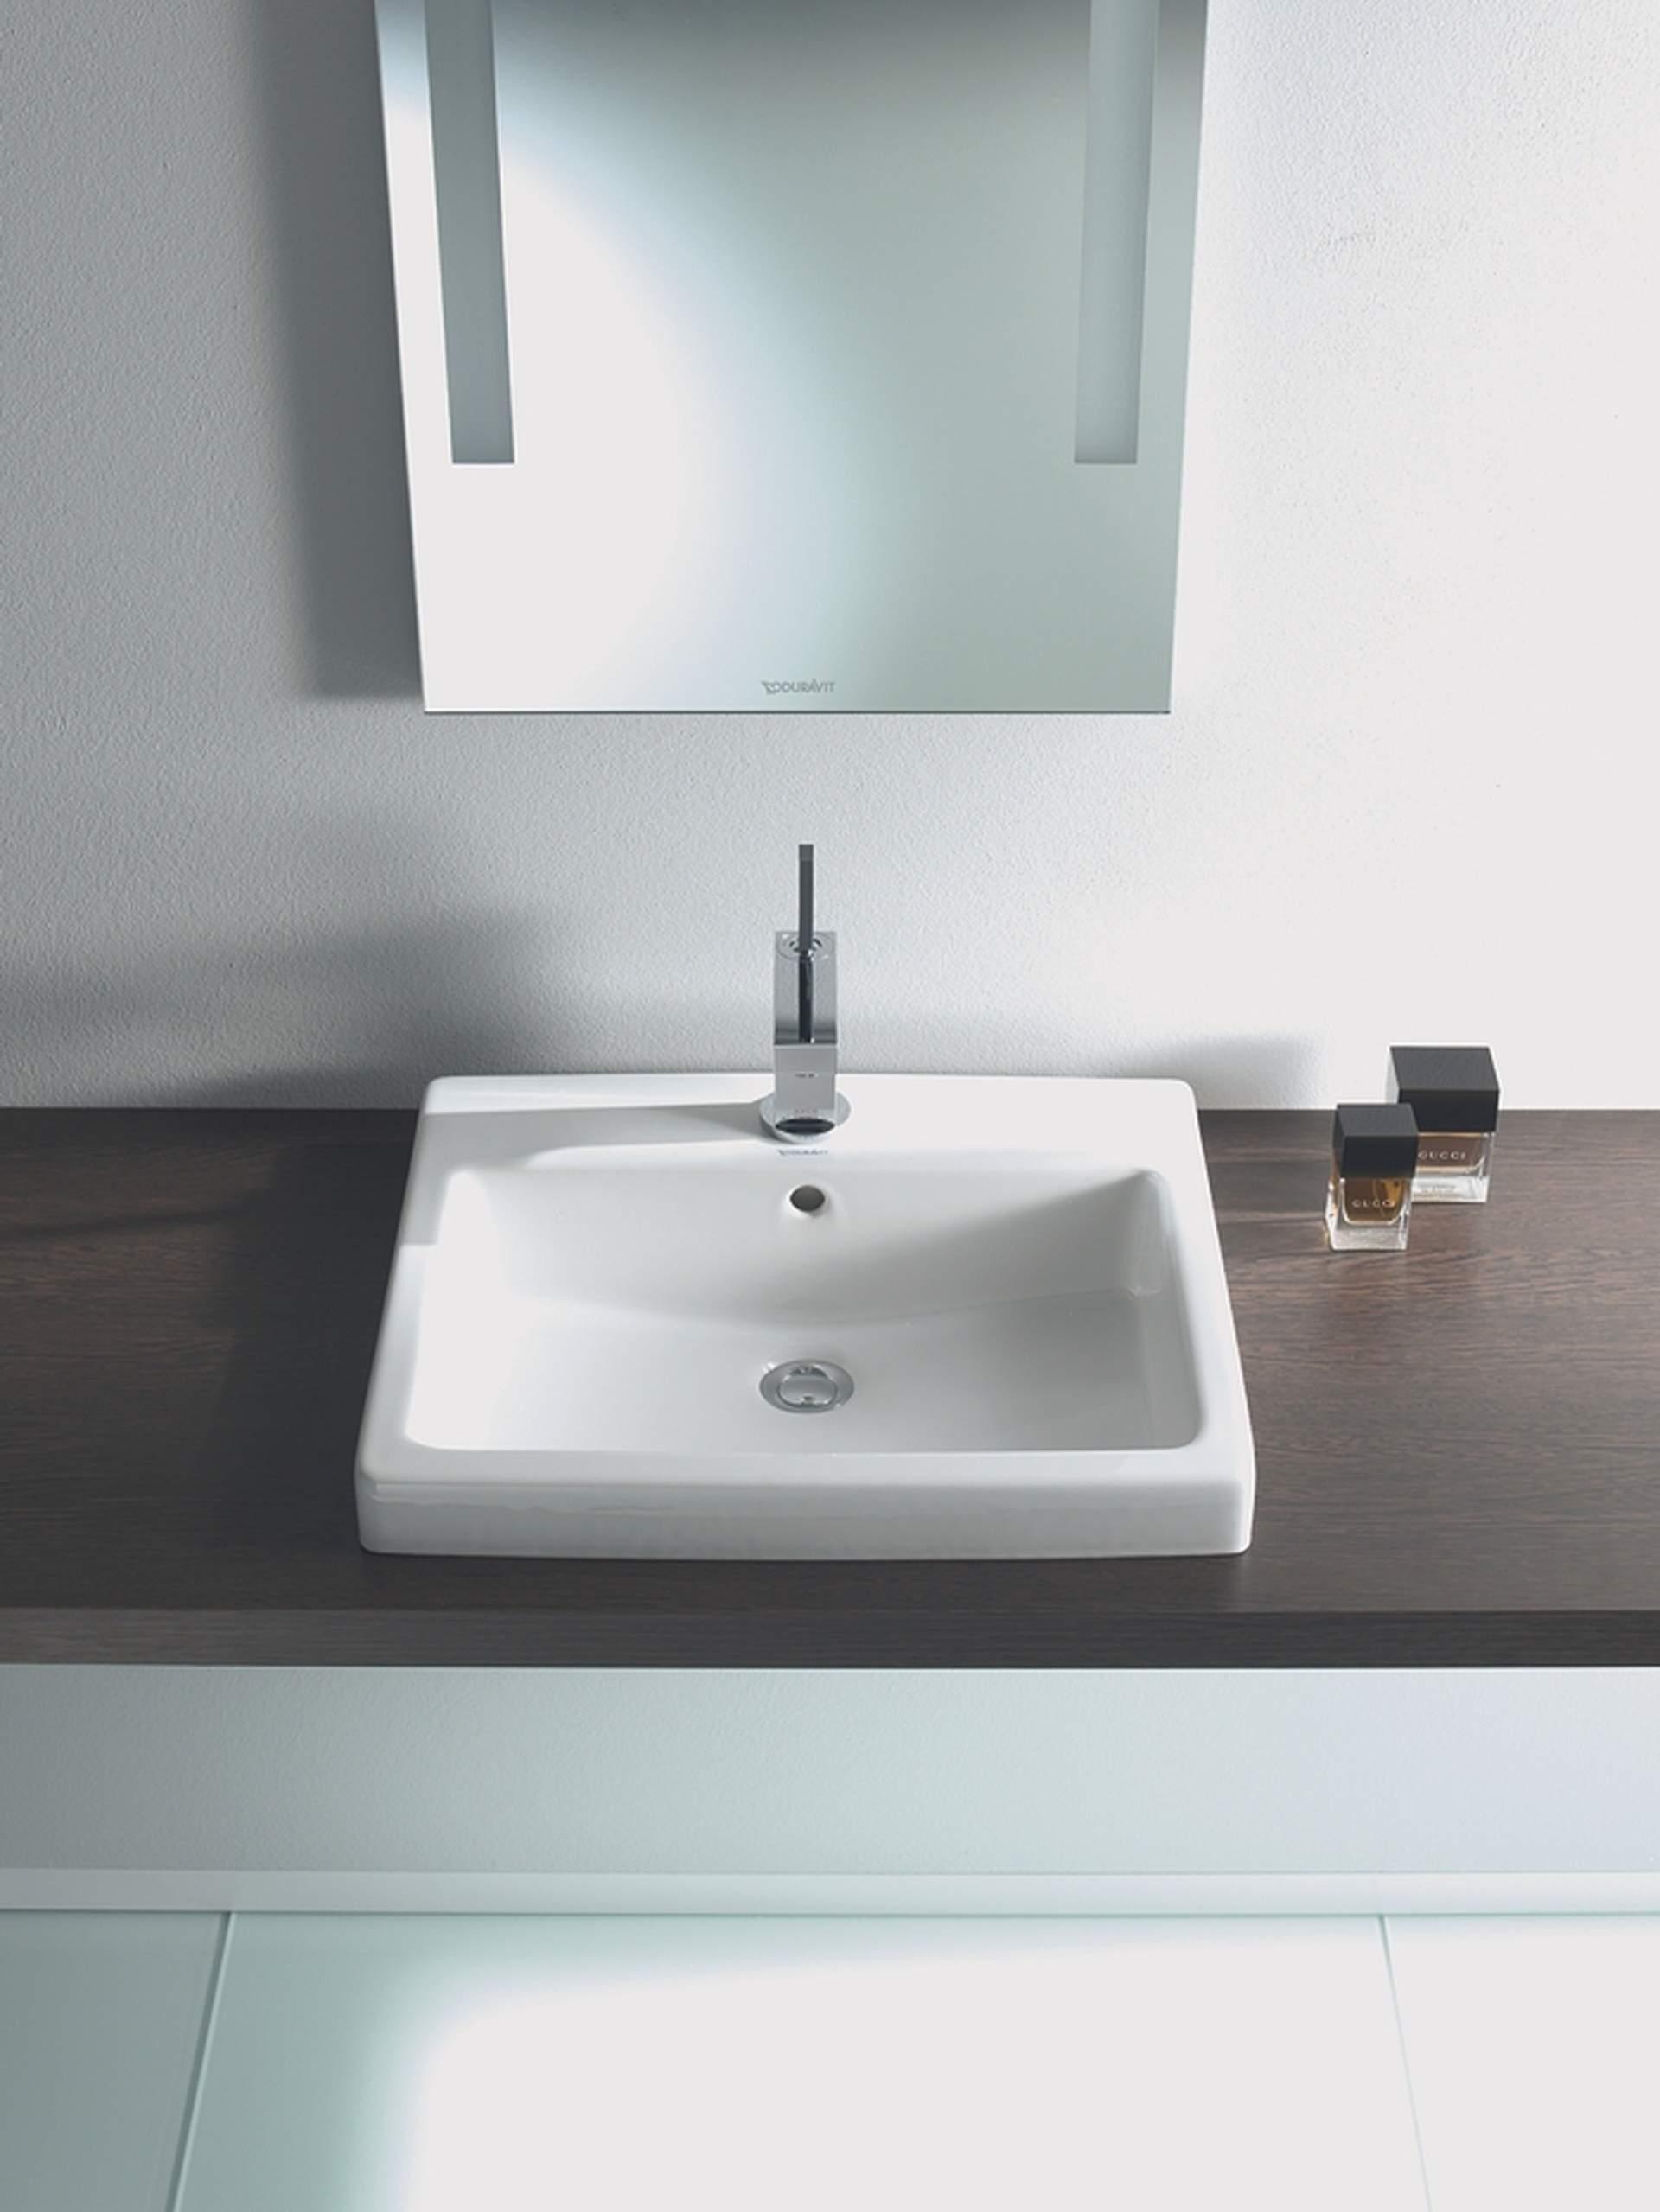 duravit vero washbasins toilets bathtubs more duravit. Black Bedroom Furniture Sets. Home Design Ideas